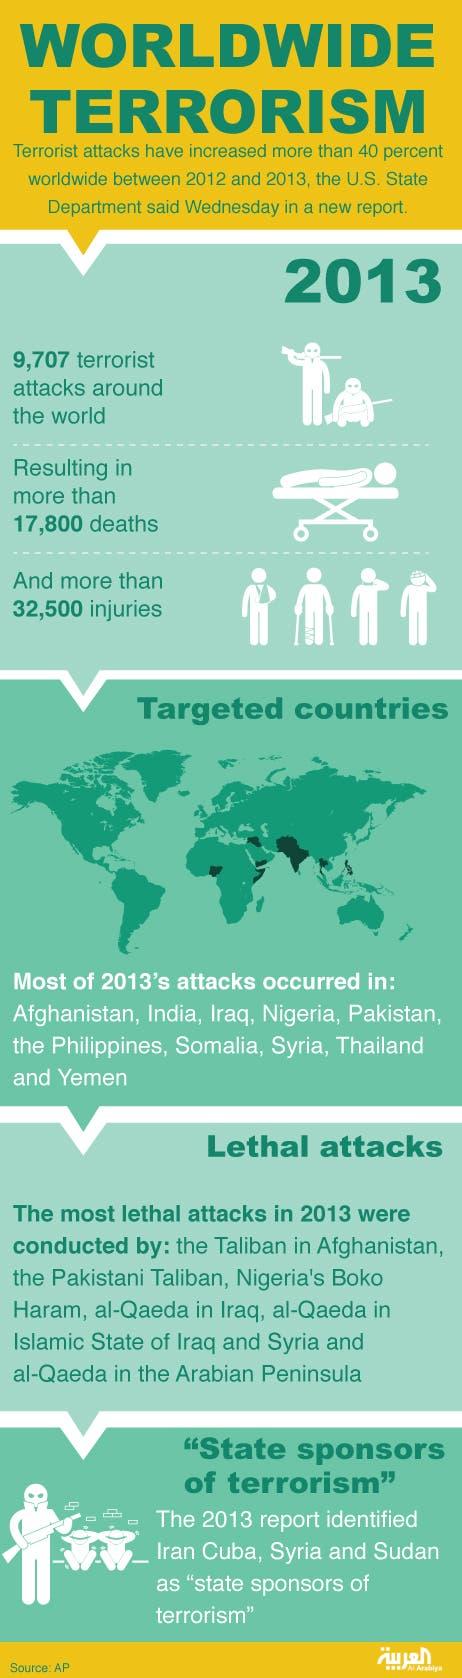 Infographic: Worldwide Terrorism